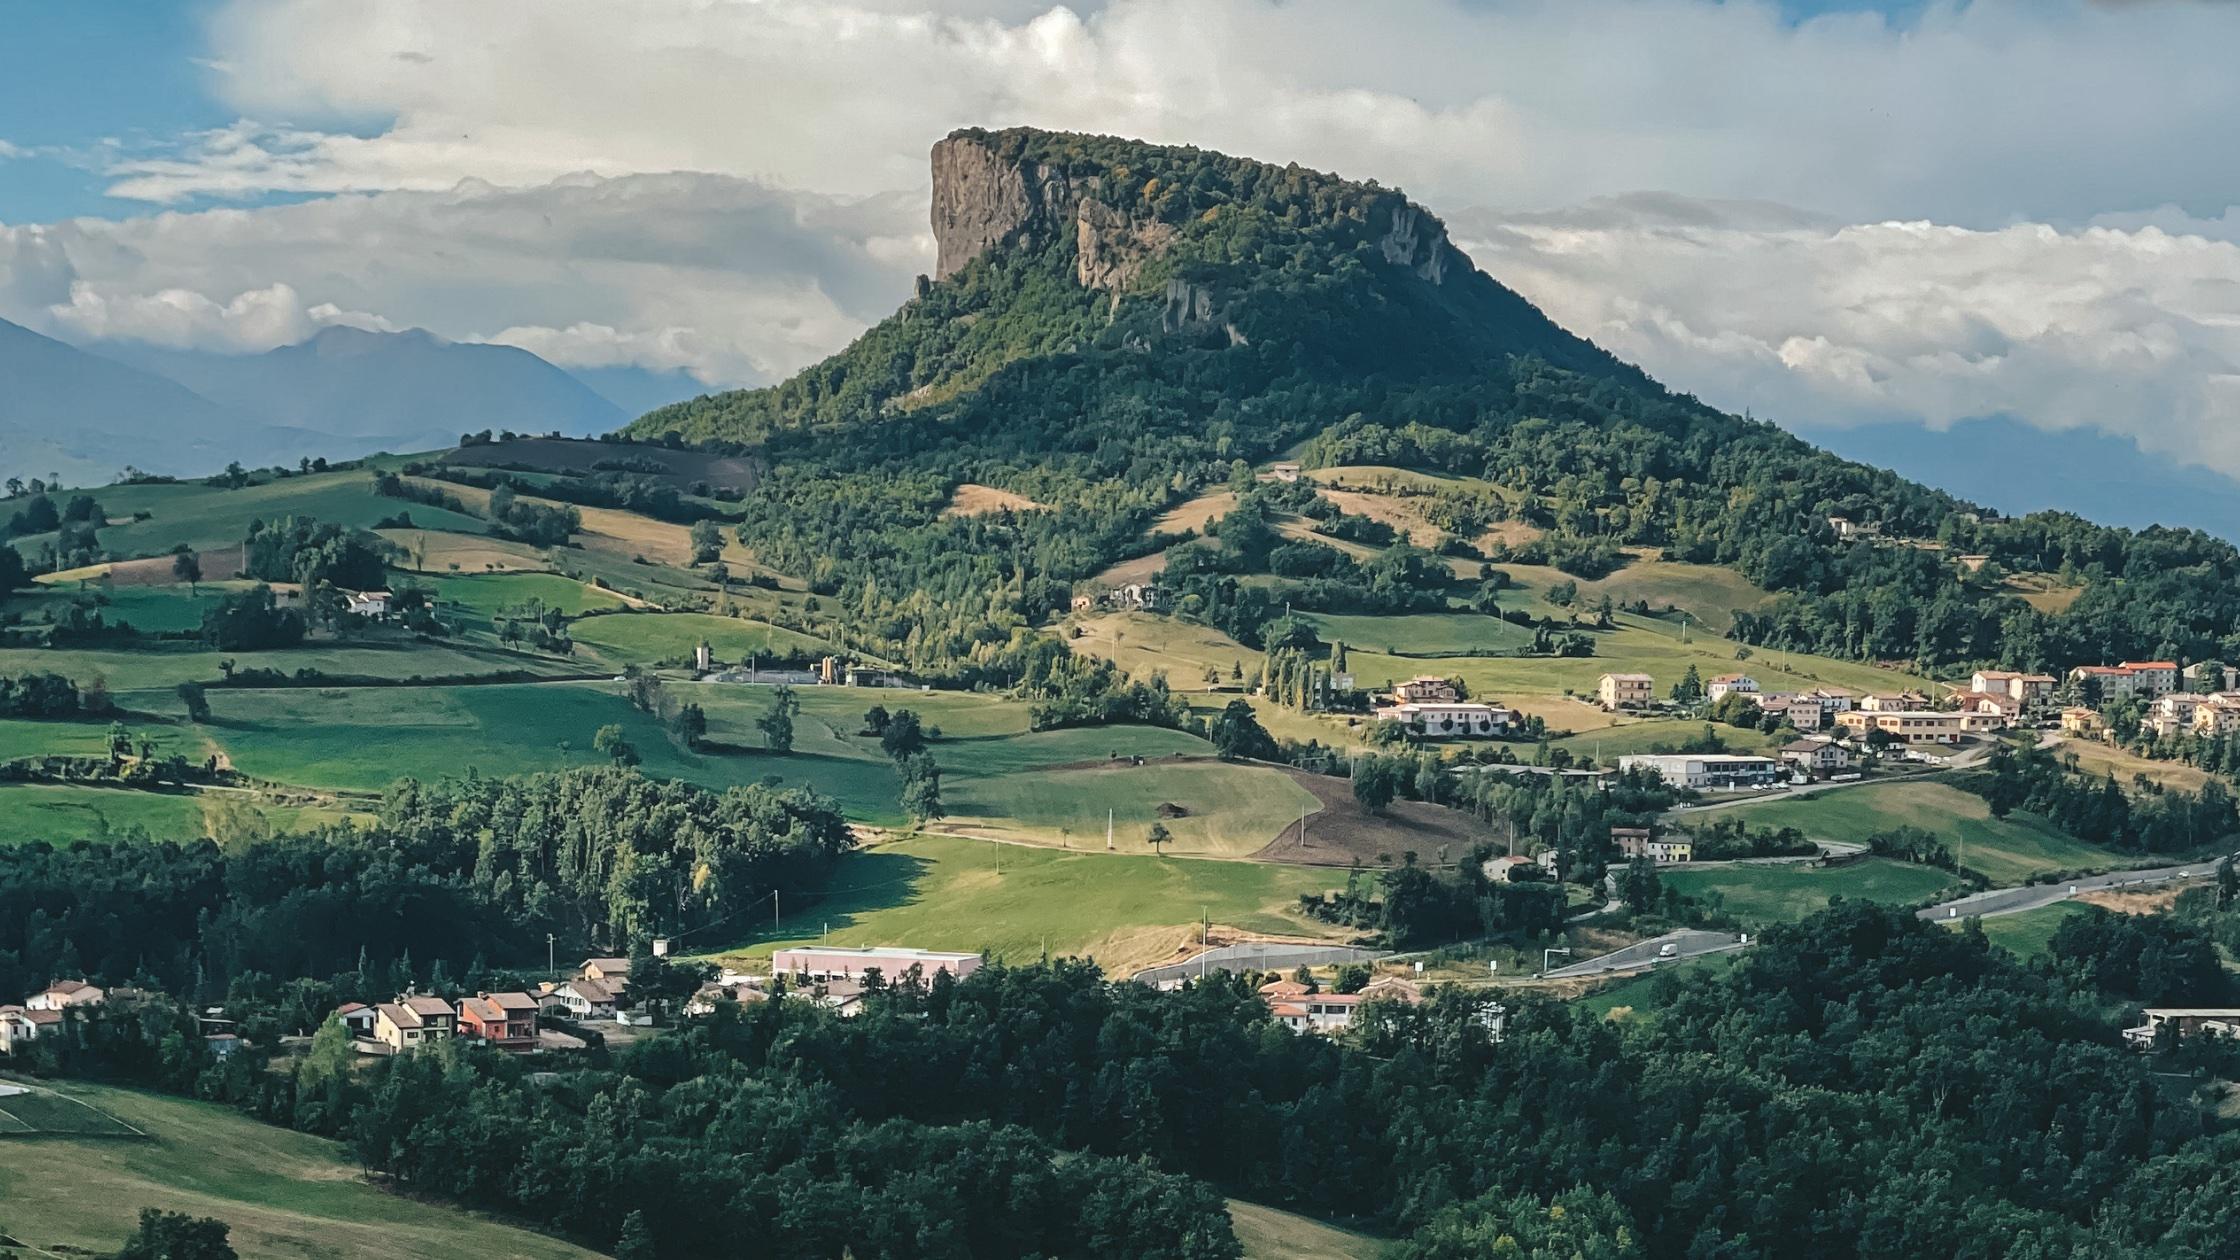 Pietra di Bismantova: The Inspiration for Dante's Purgatory